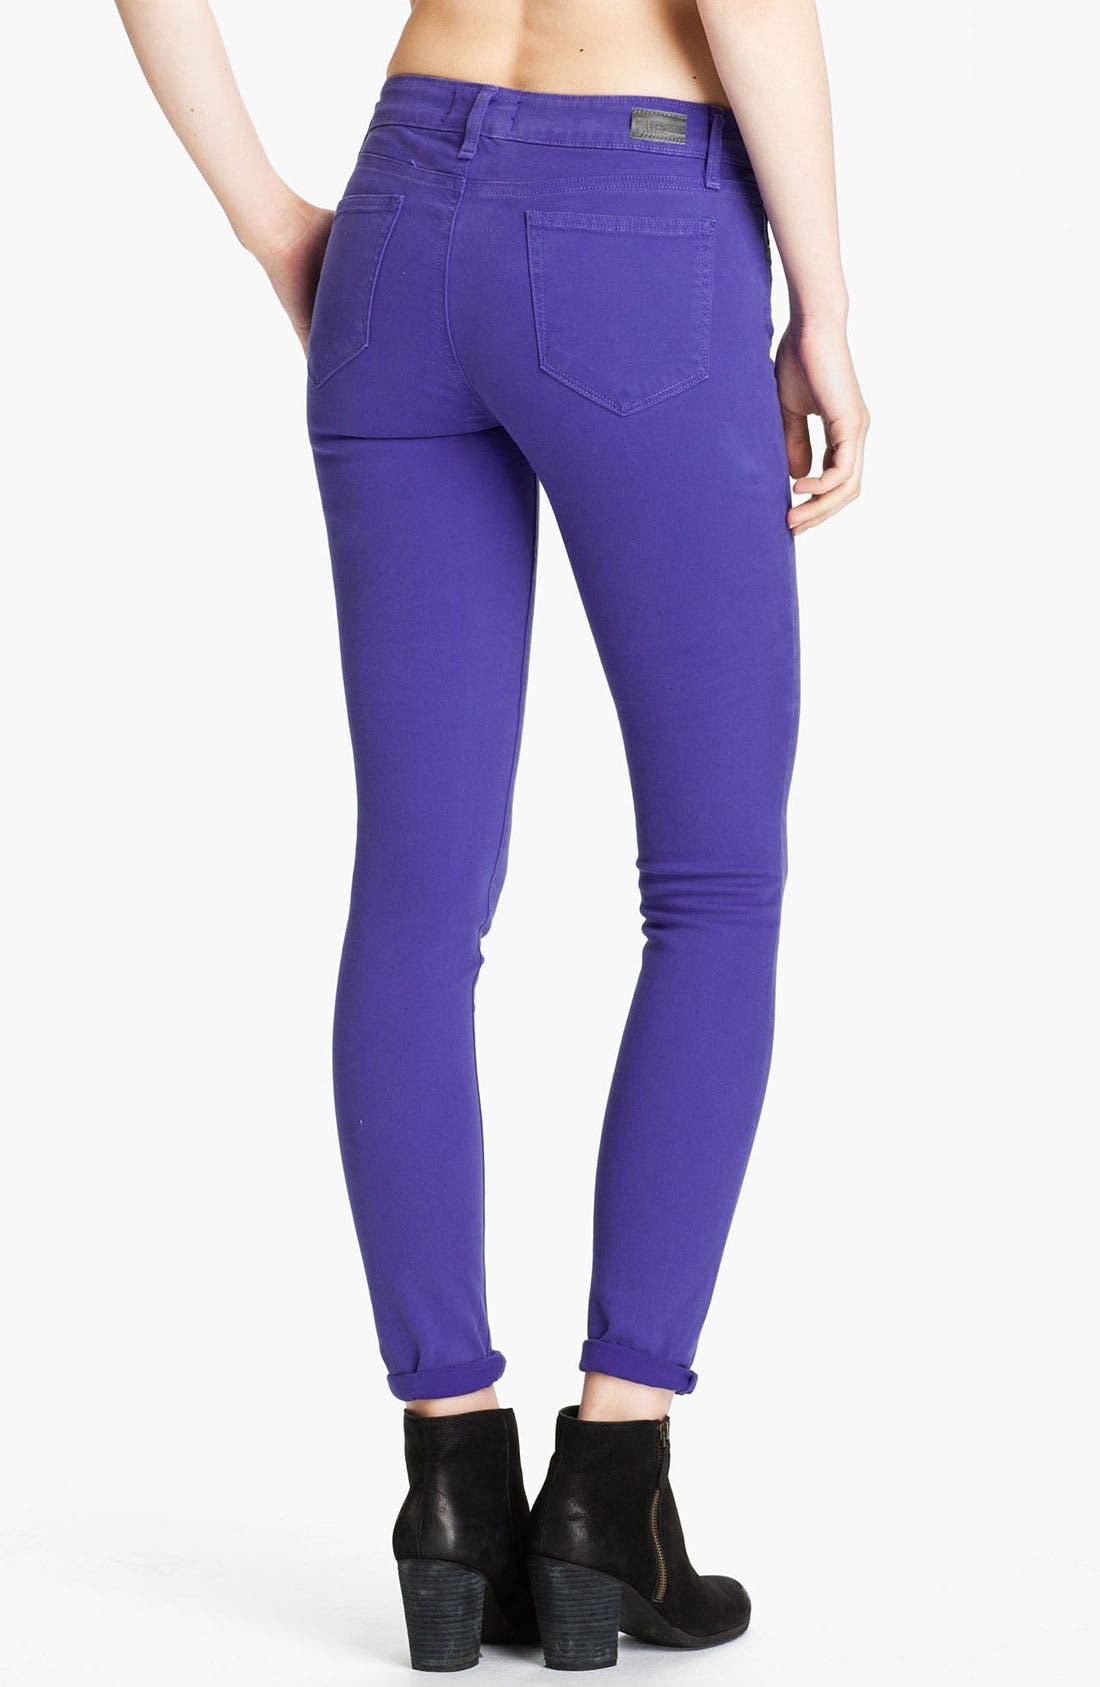 Alternate Image 2  - Paige Denim 'Verdugo' Skinny Stretch Denim Jeans (Violet Blue)